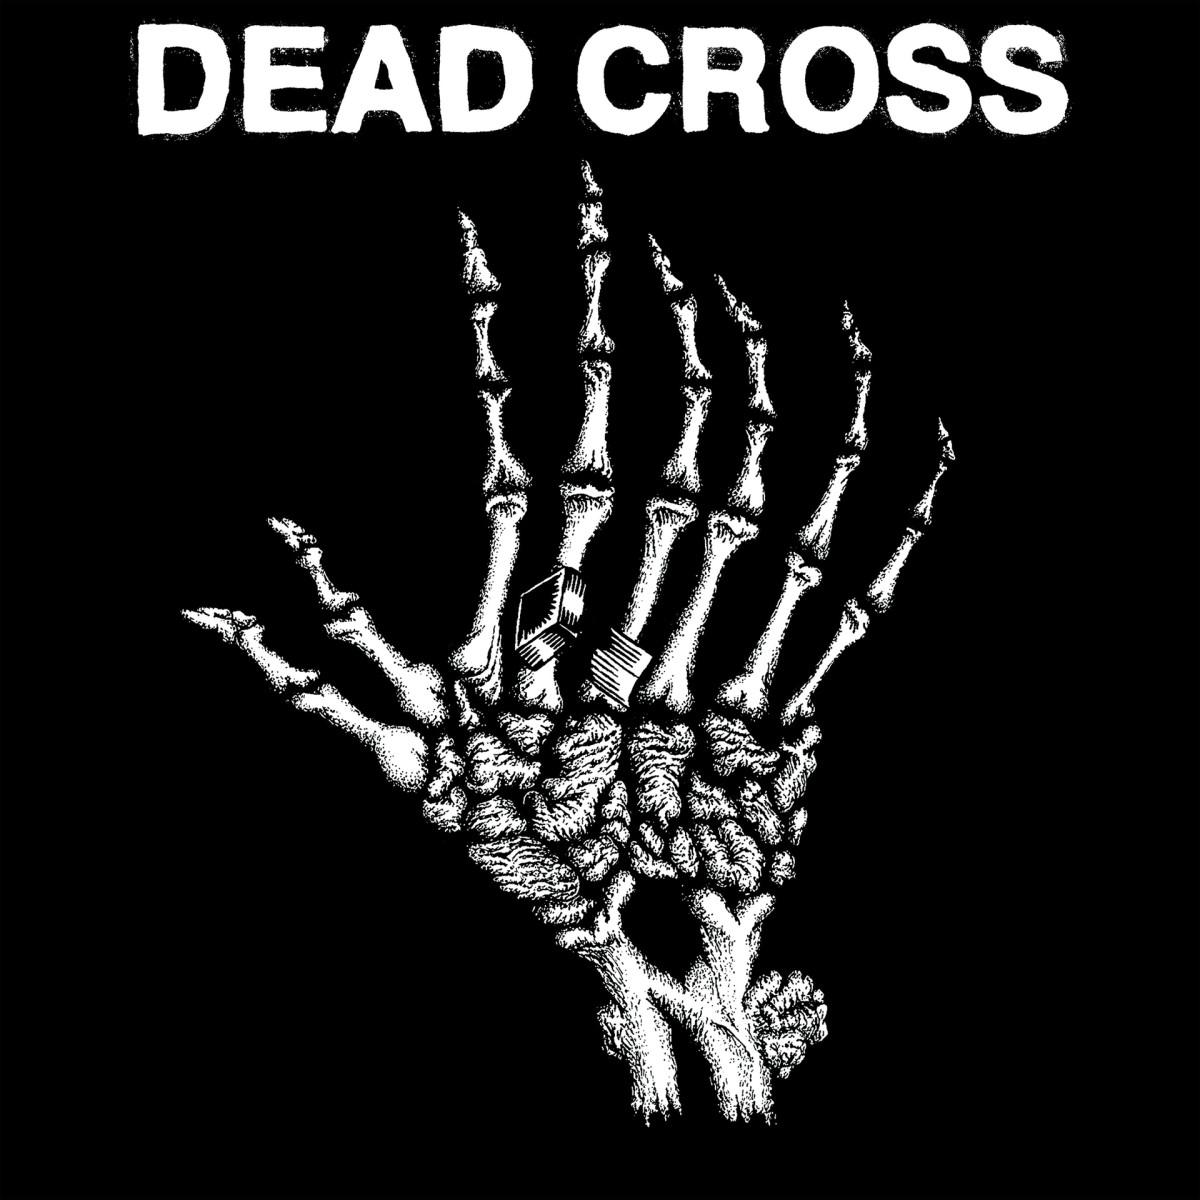 DeadCrossEPCover2018-1200x1200.jpg